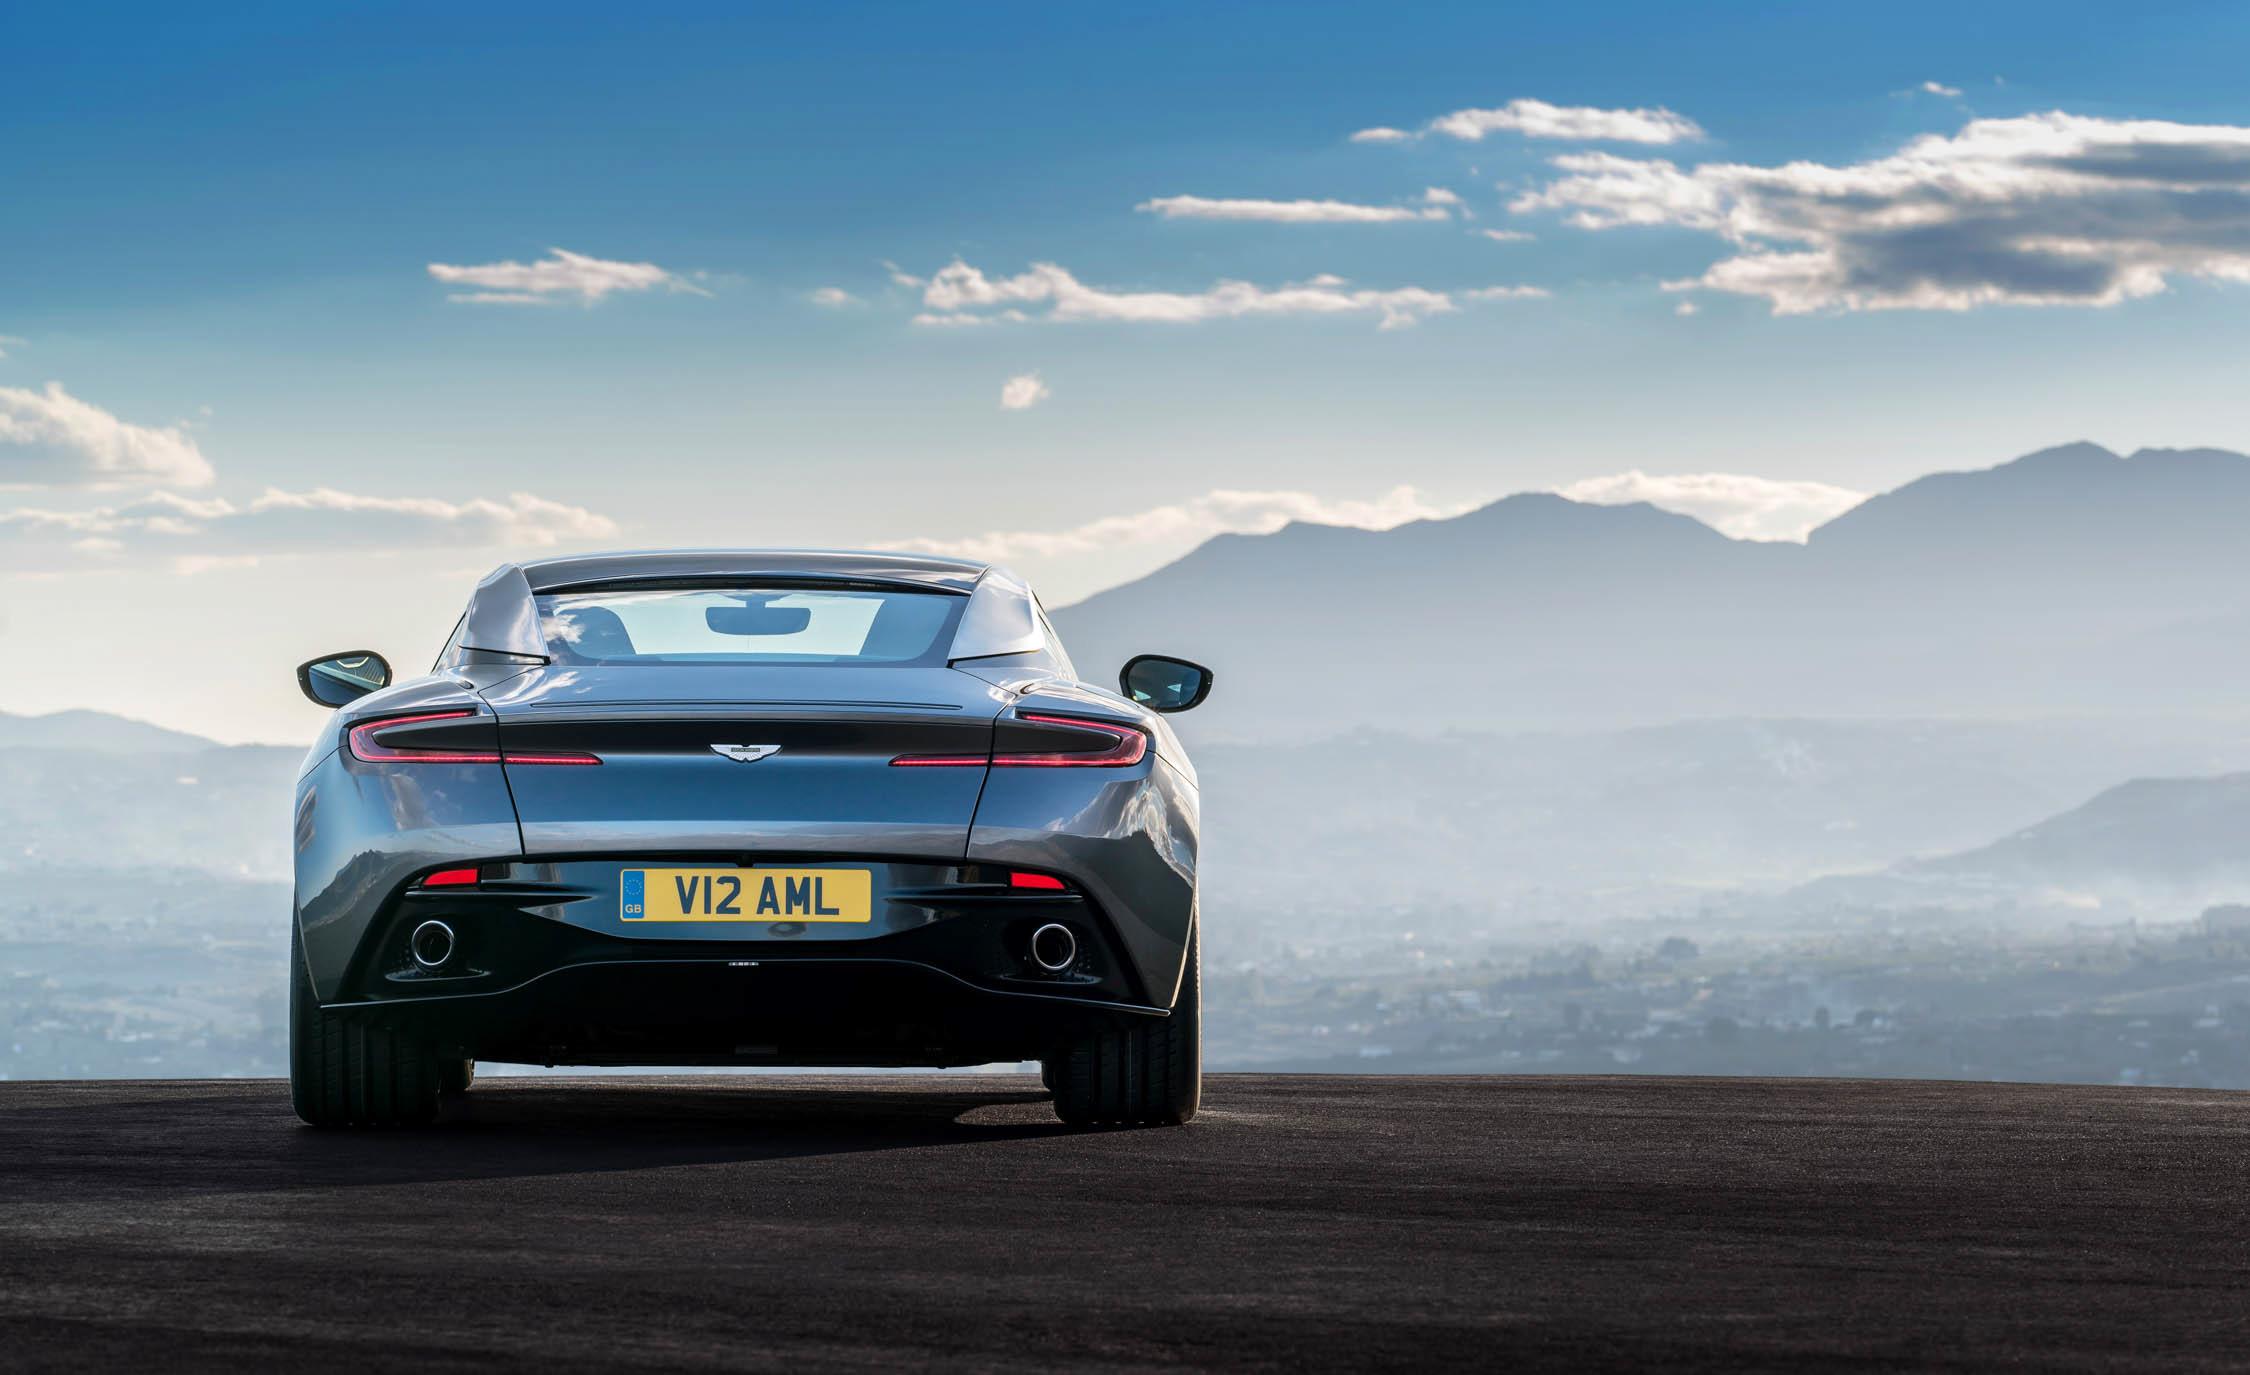 2017 Aston Martin Db11 Exterior Rear View (View 18 of 22)